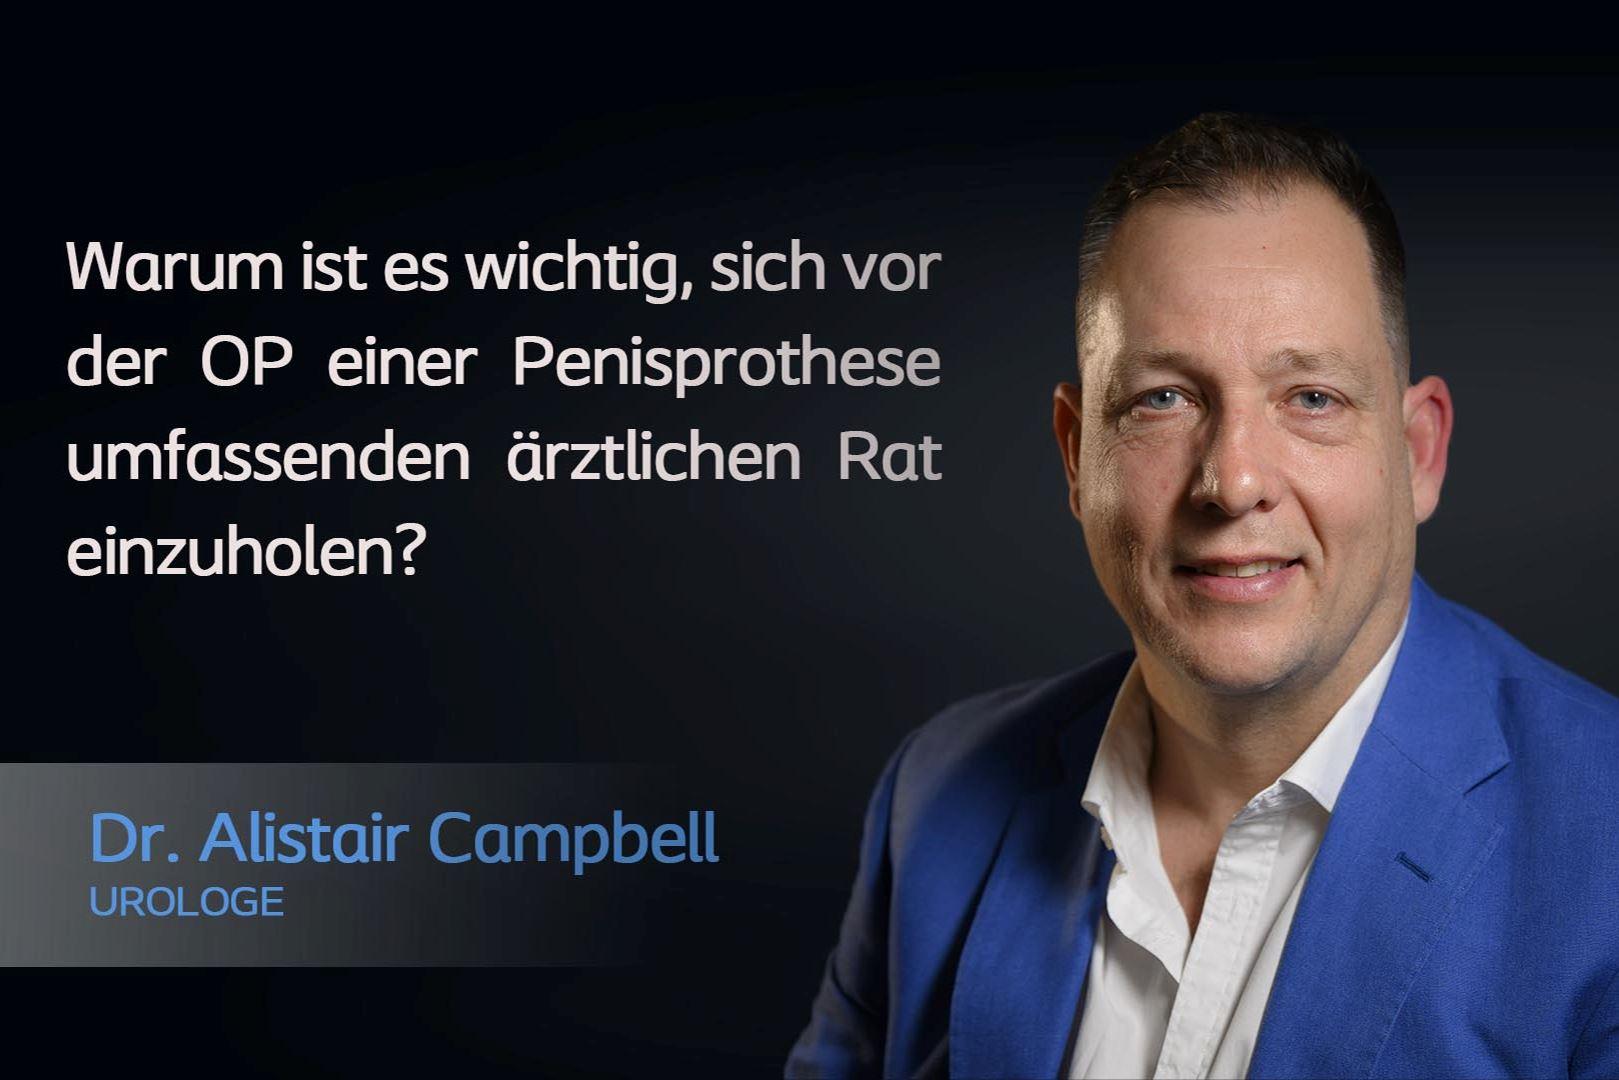 Penisprothese-ärztlicher-rat-vor-op